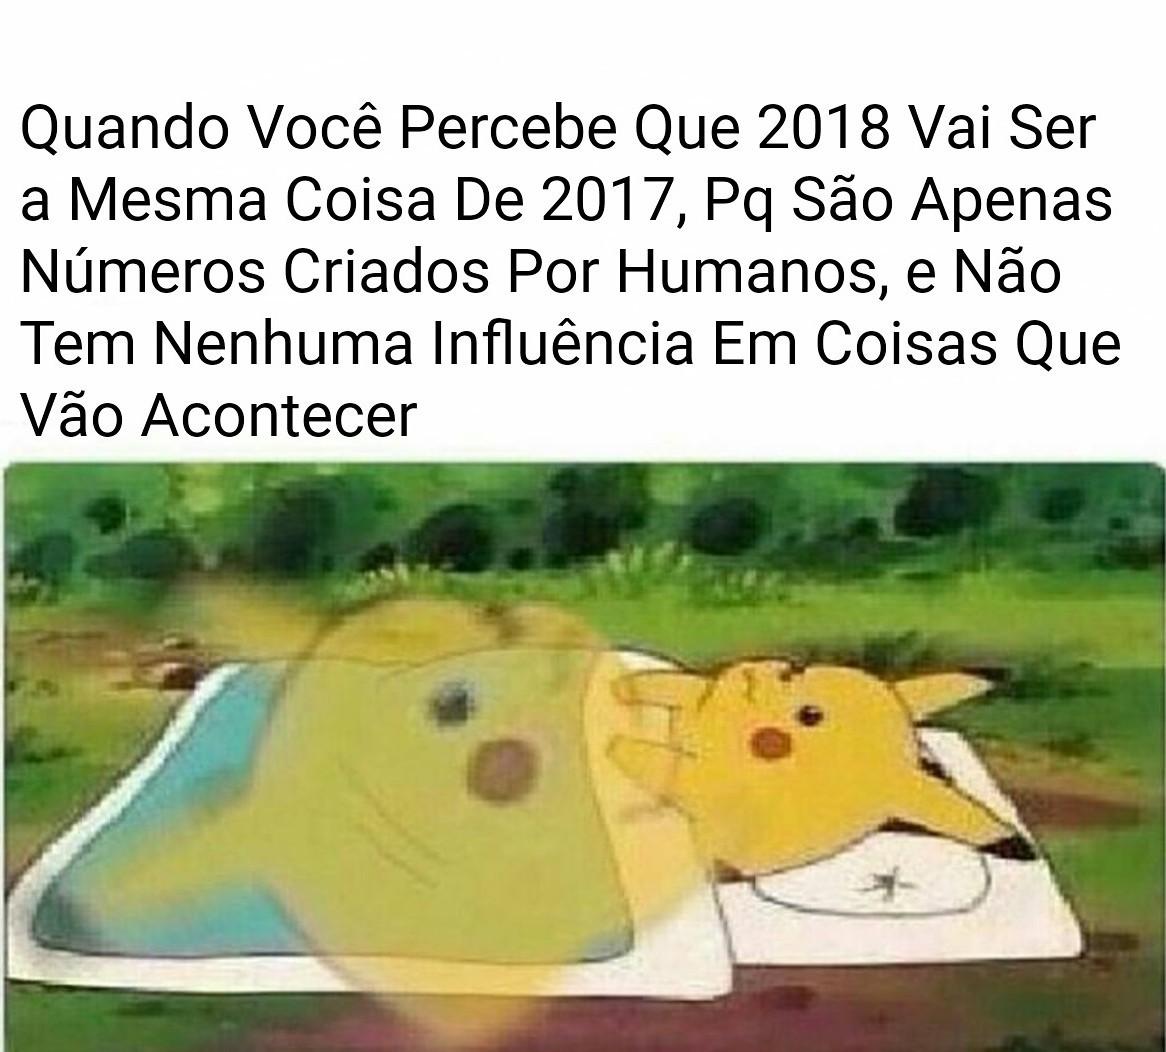 Monkepo! - meme